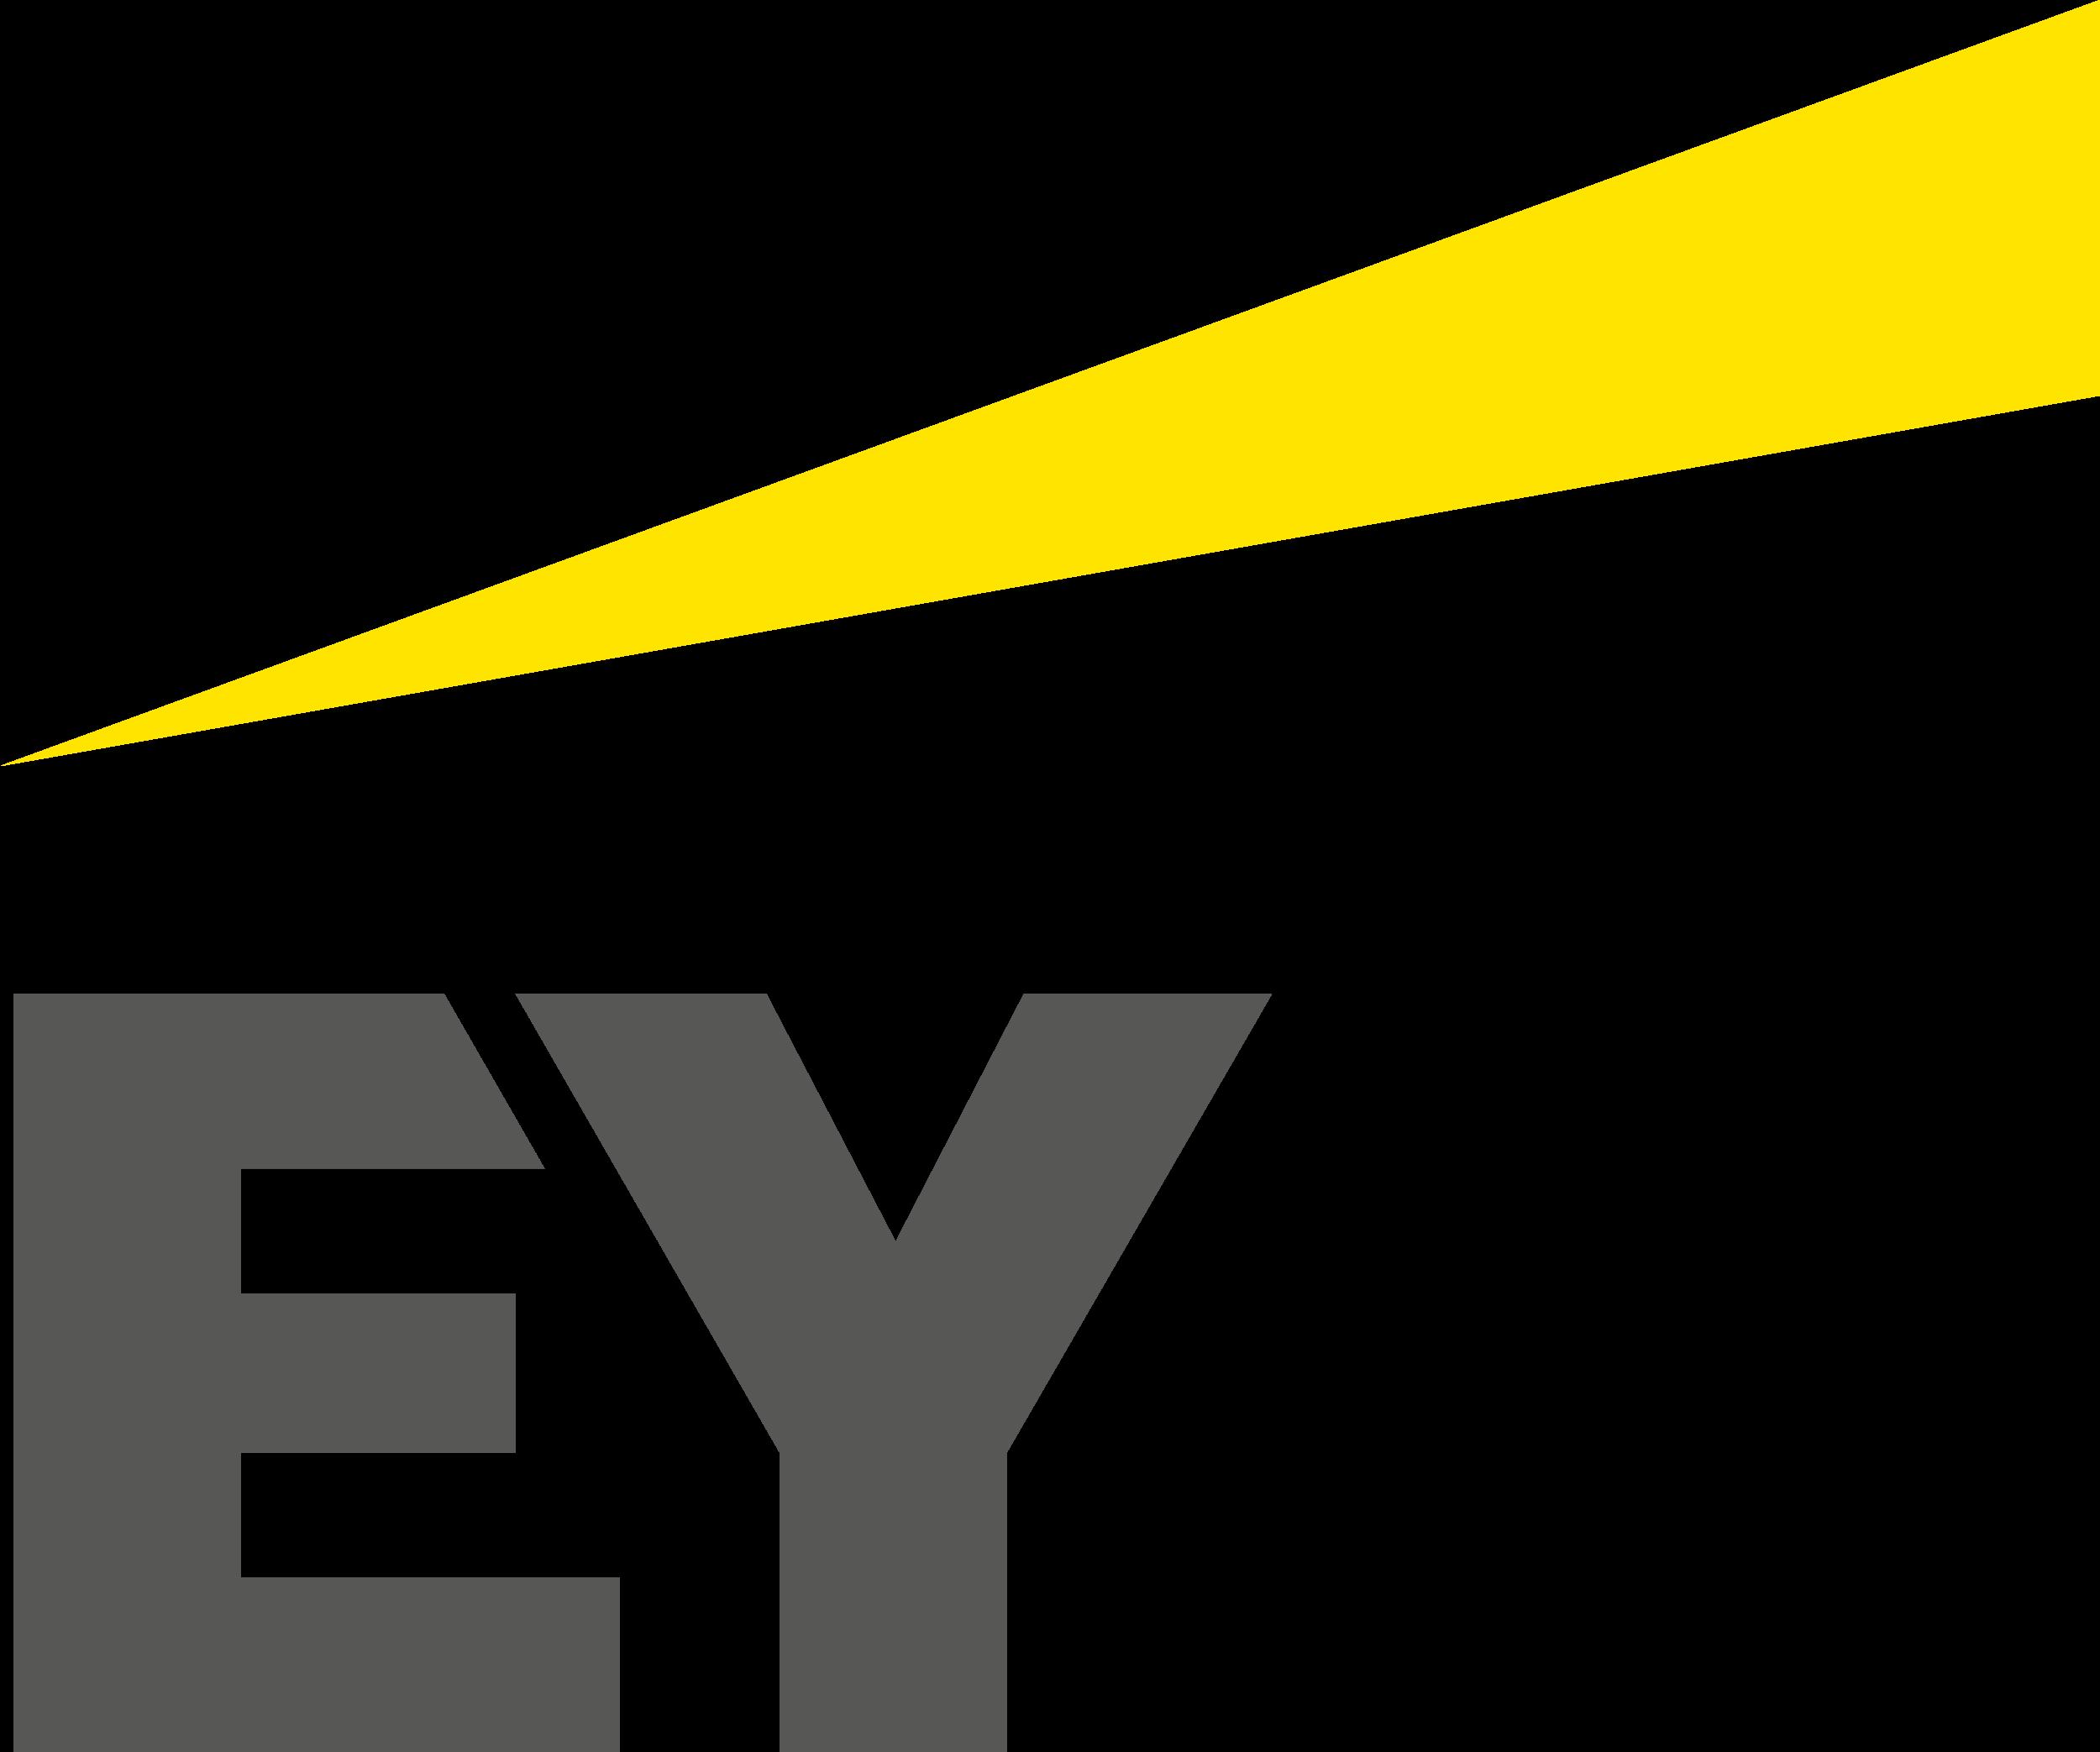 EY Sponsor Logo